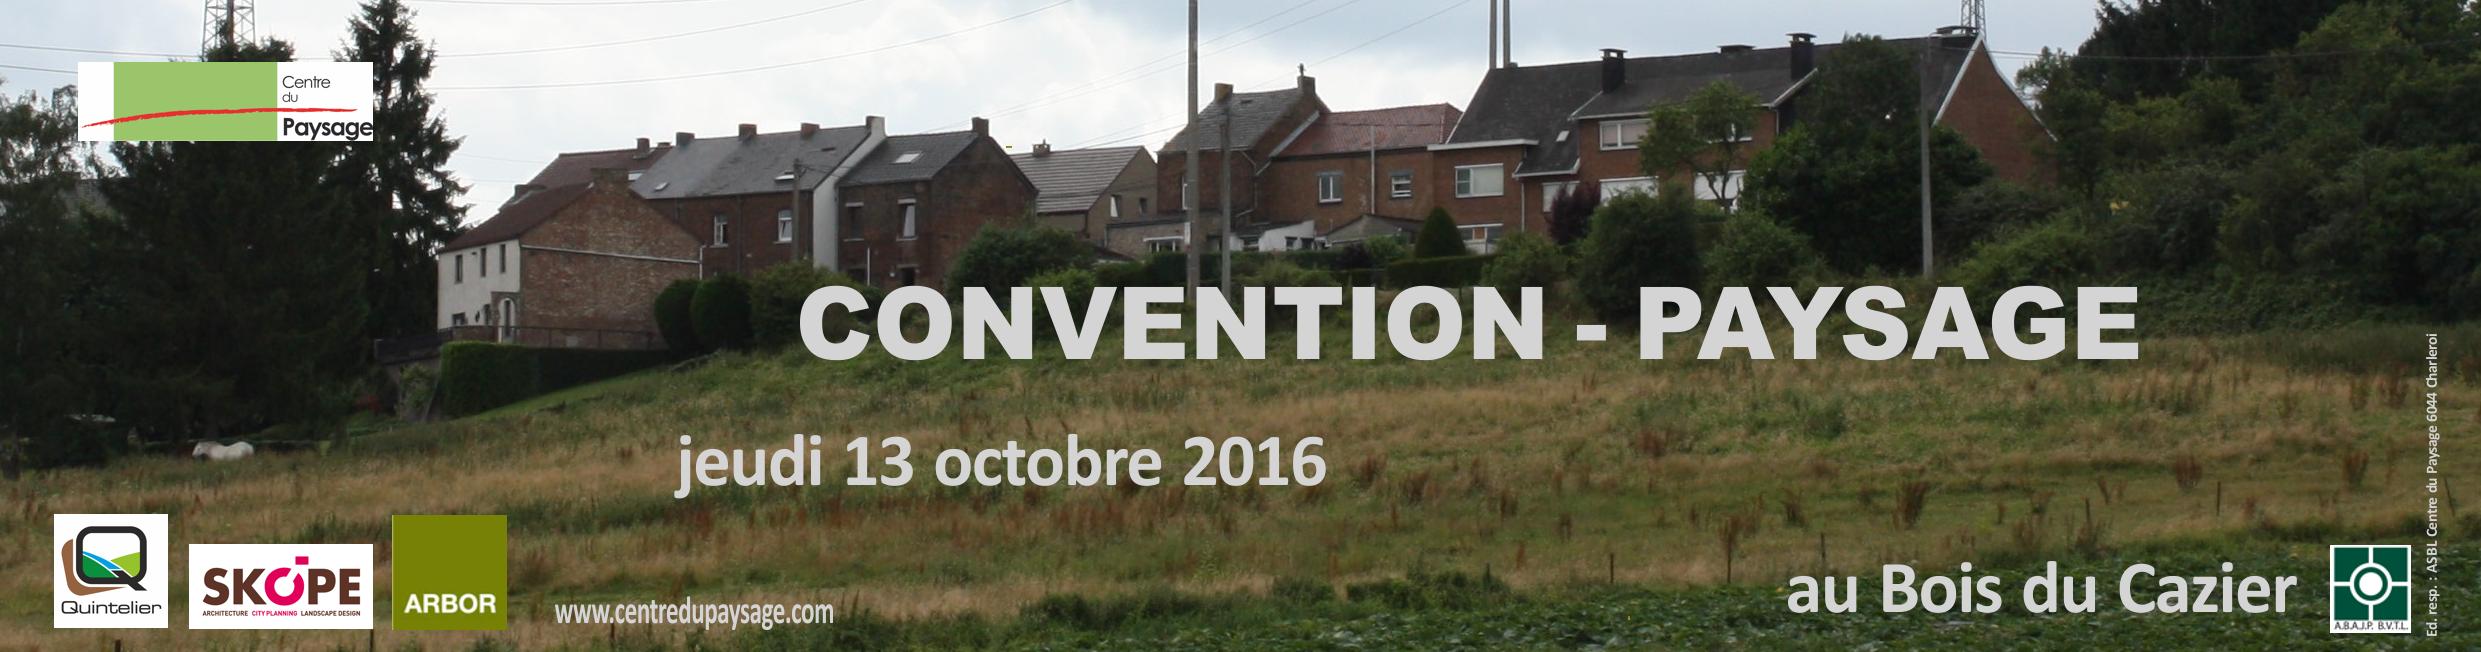 urbanisation de la campagne